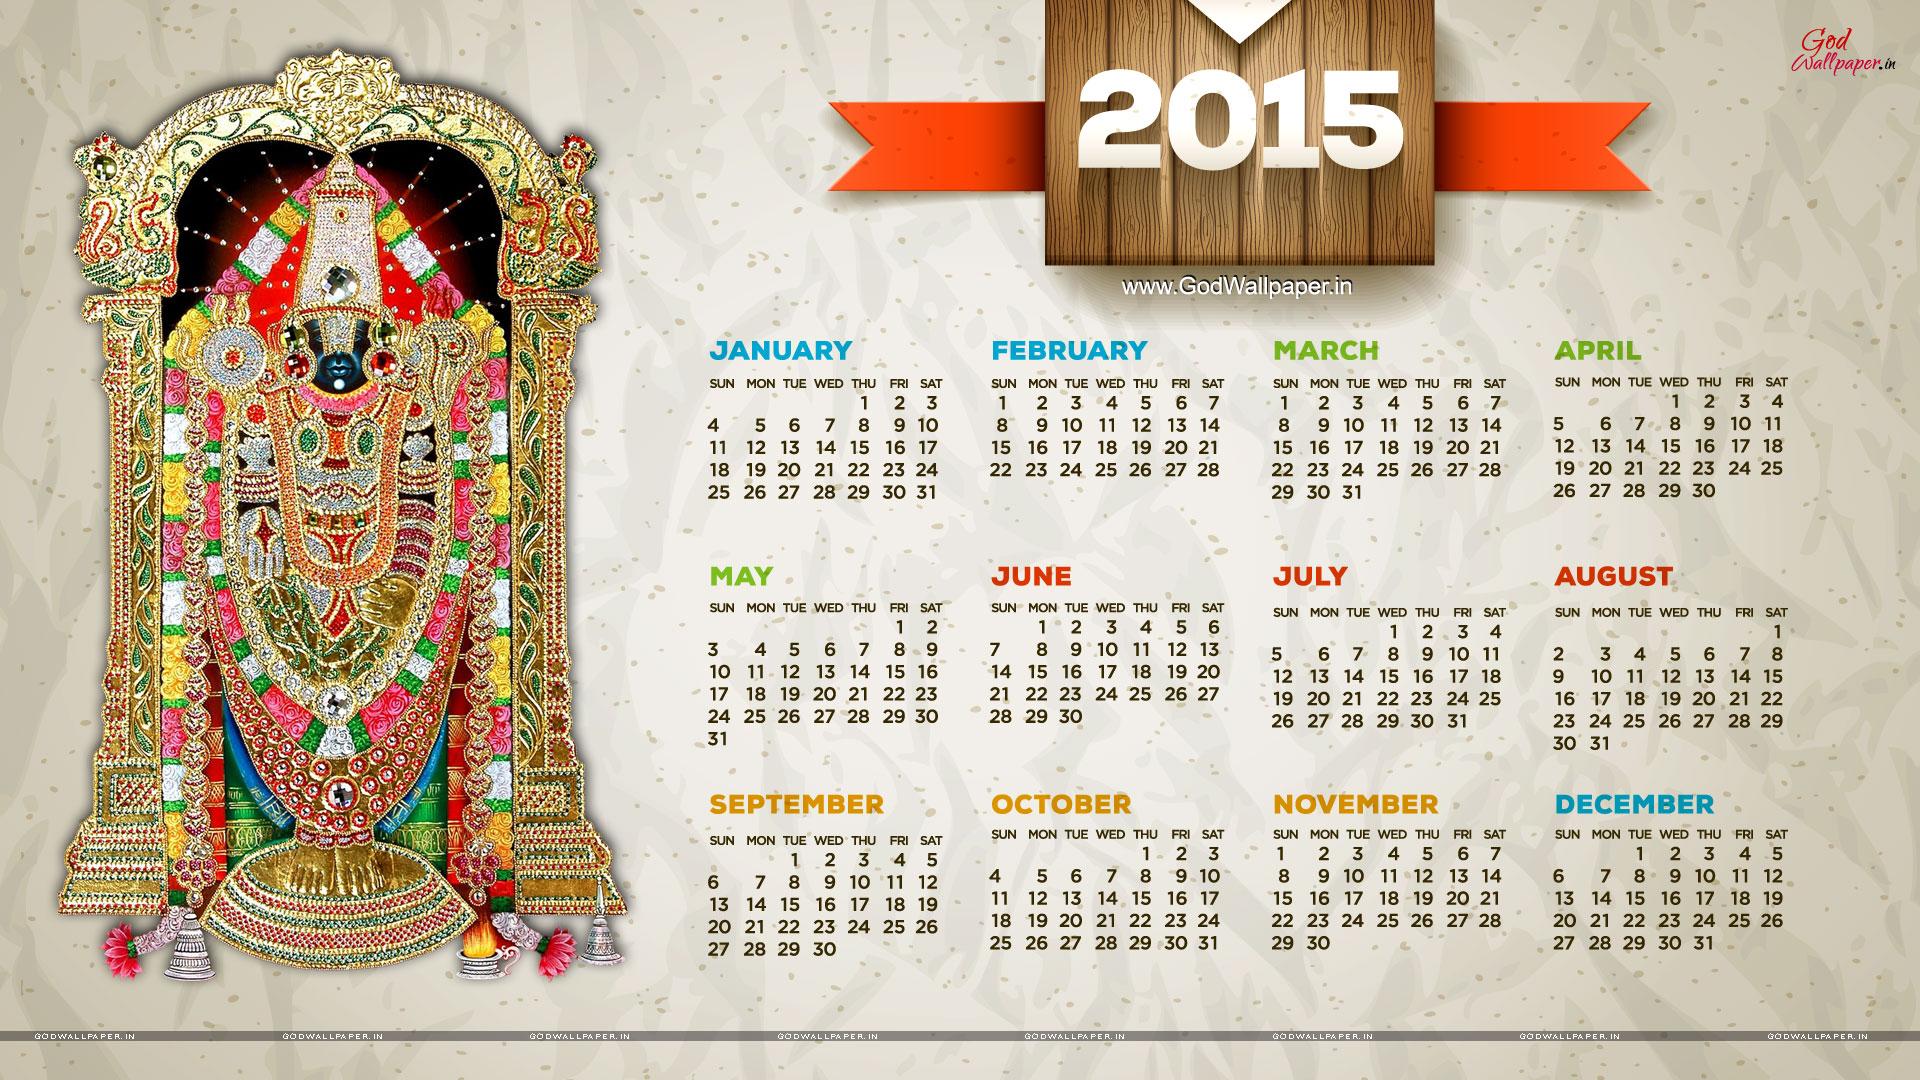 Desktop Wallpaper Calendar 2015 Download 1920x1080